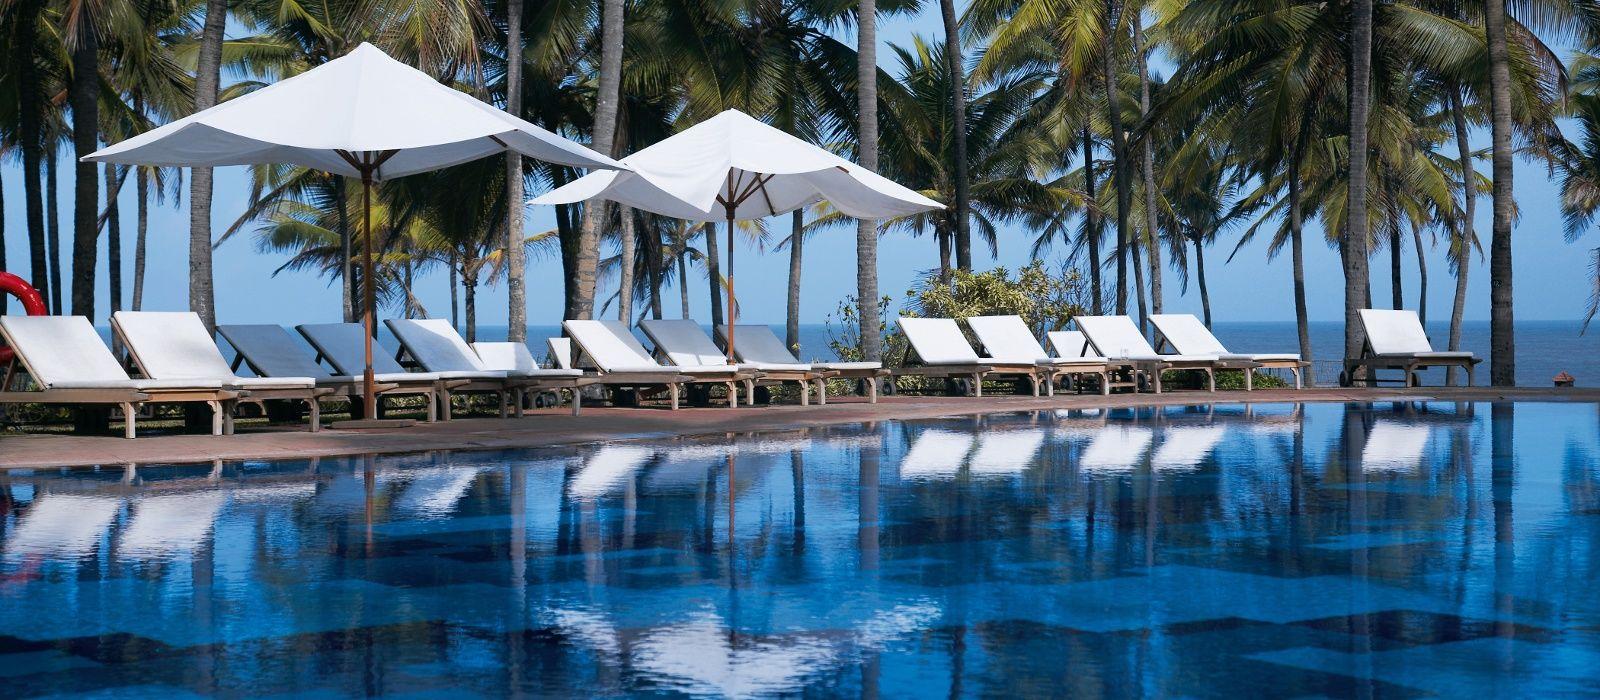 Hotel Vivanta by Taj – Holiday Village Islands & Beaches